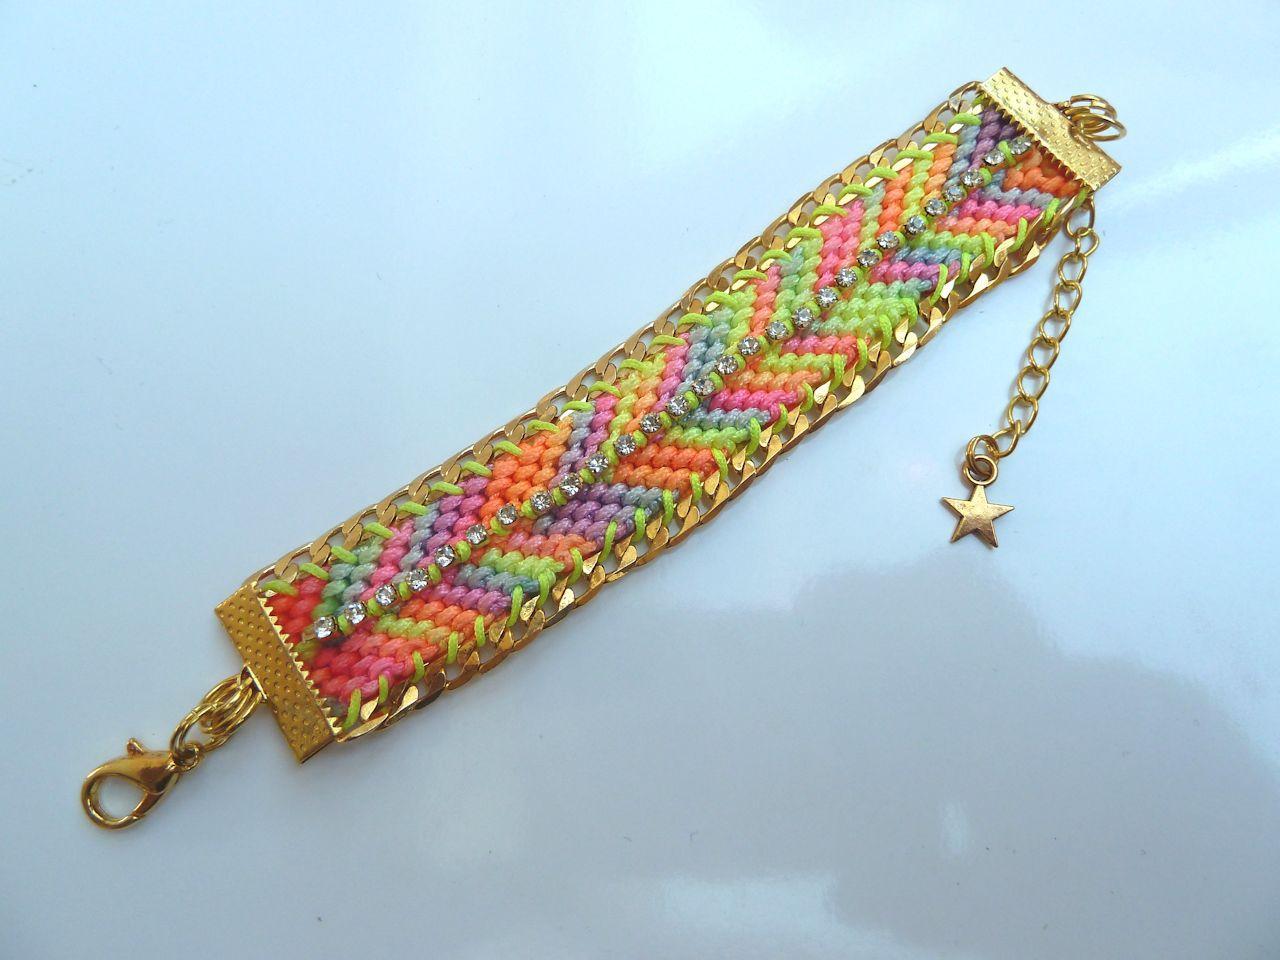 Tuto diy bracelet copacabana paperblog - Bracelets bresiliens originaux ...